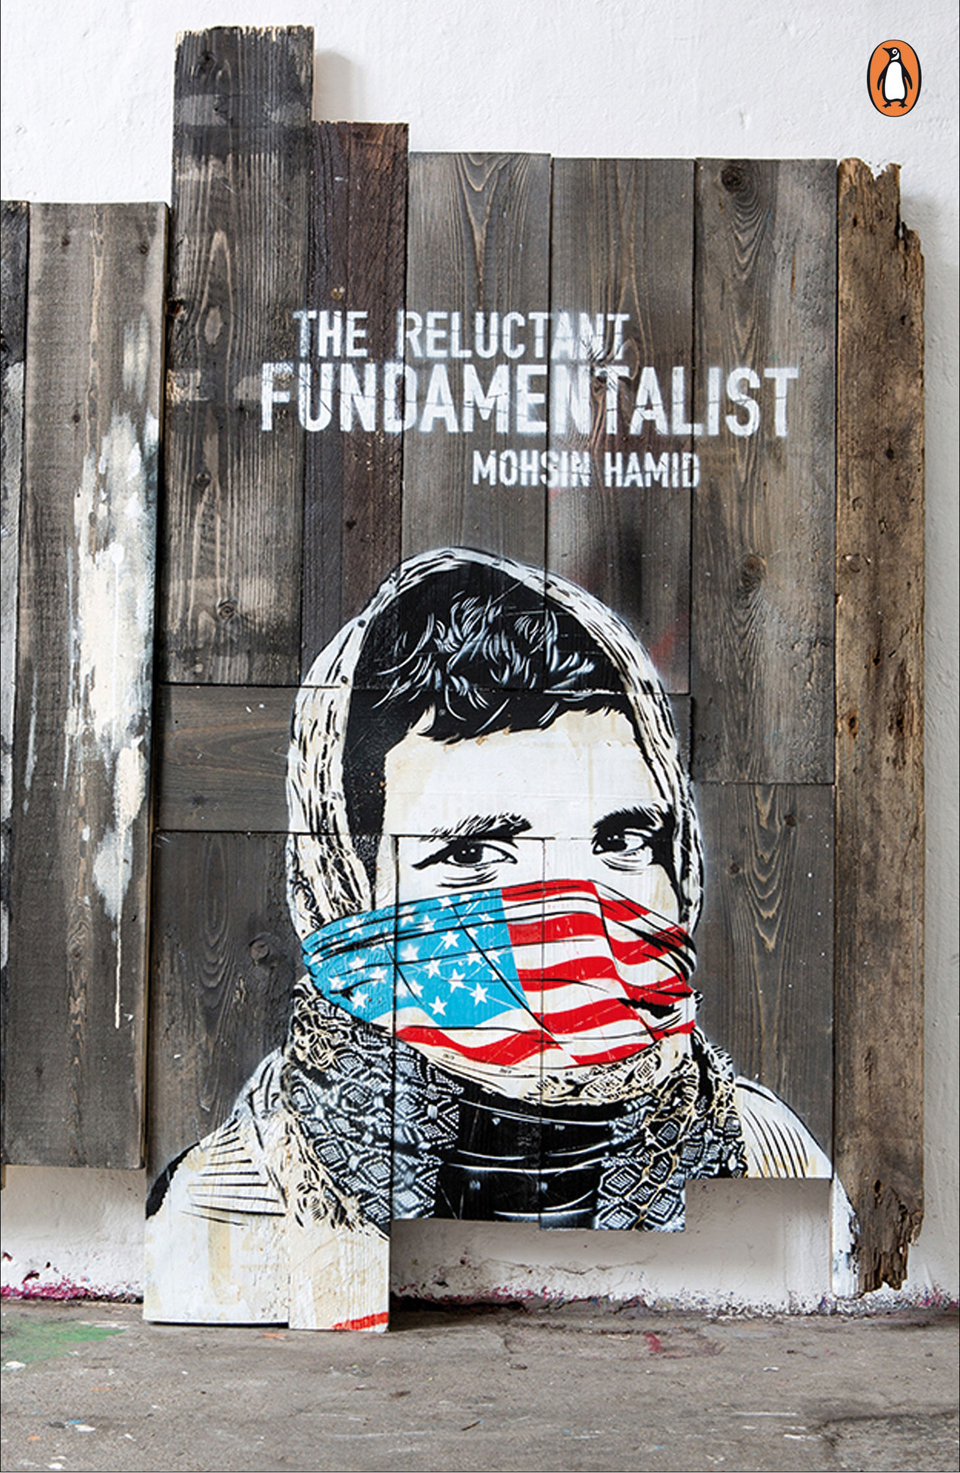 The Reluctant Fundamentalist (Mohsin Hamid) - Artista: Mittenimwald